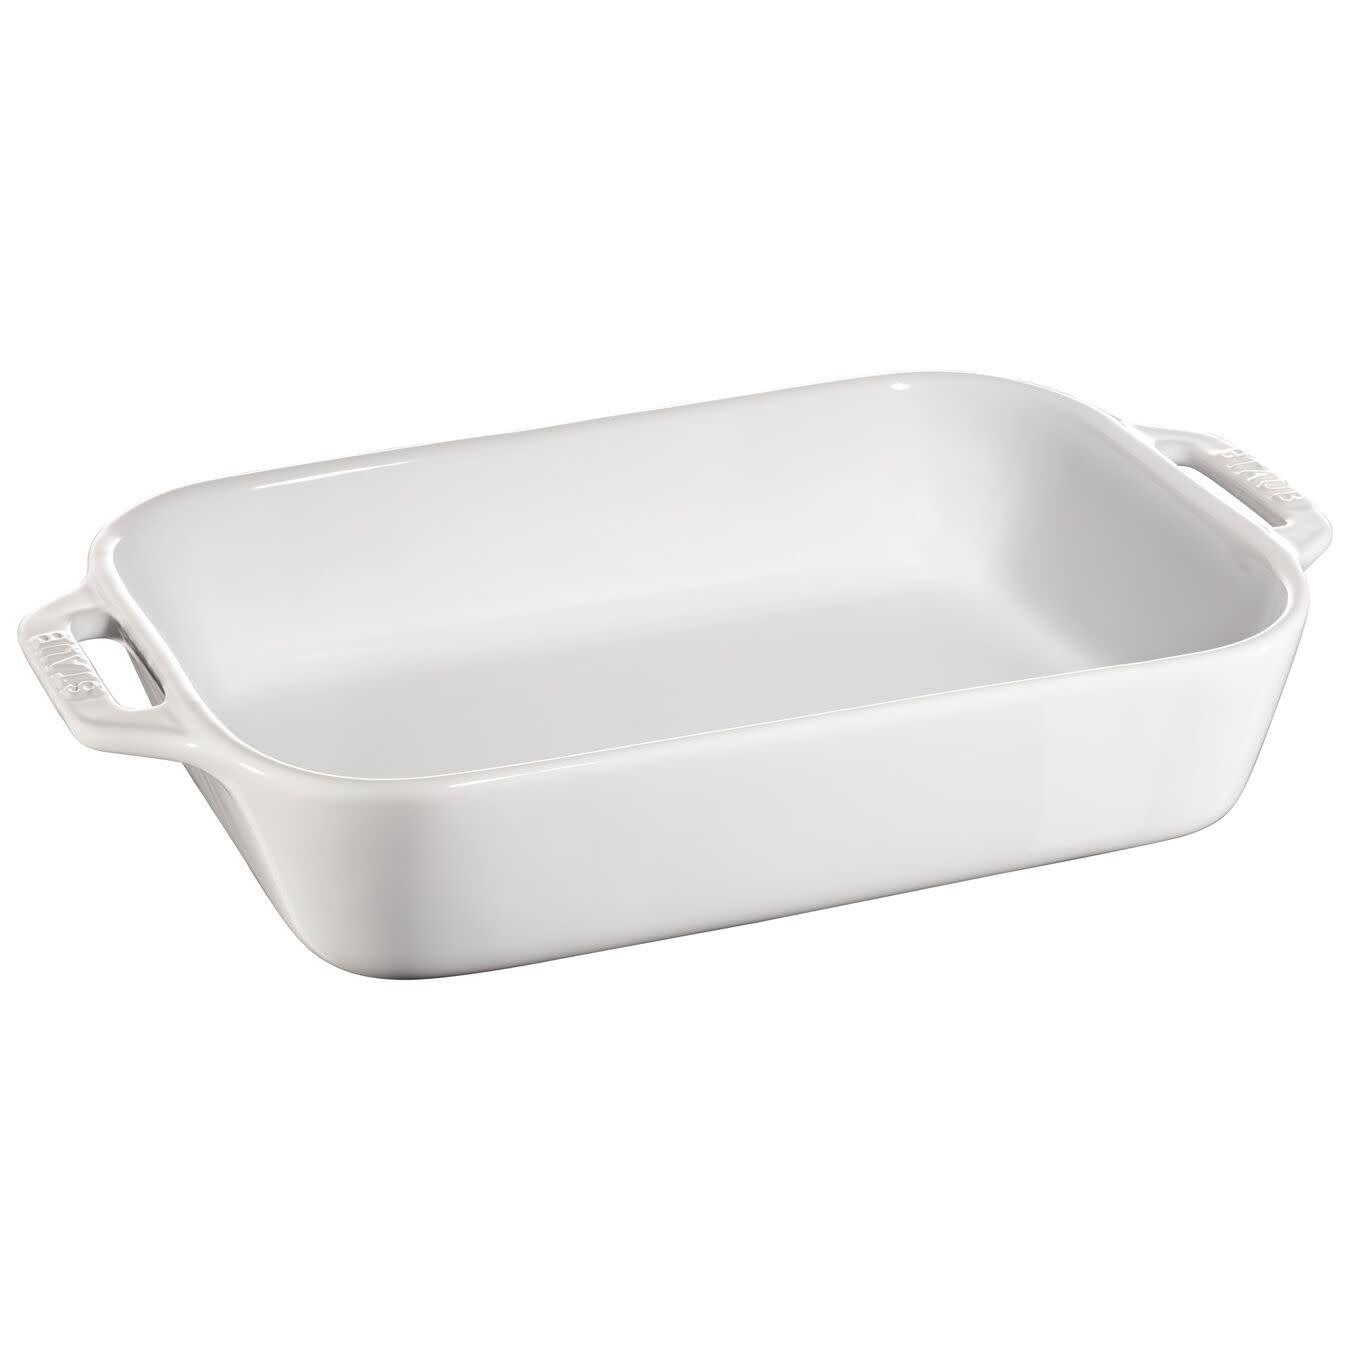 "Staub Rect Baking Dish  27x20cm / 10.5""x7.5"" White"